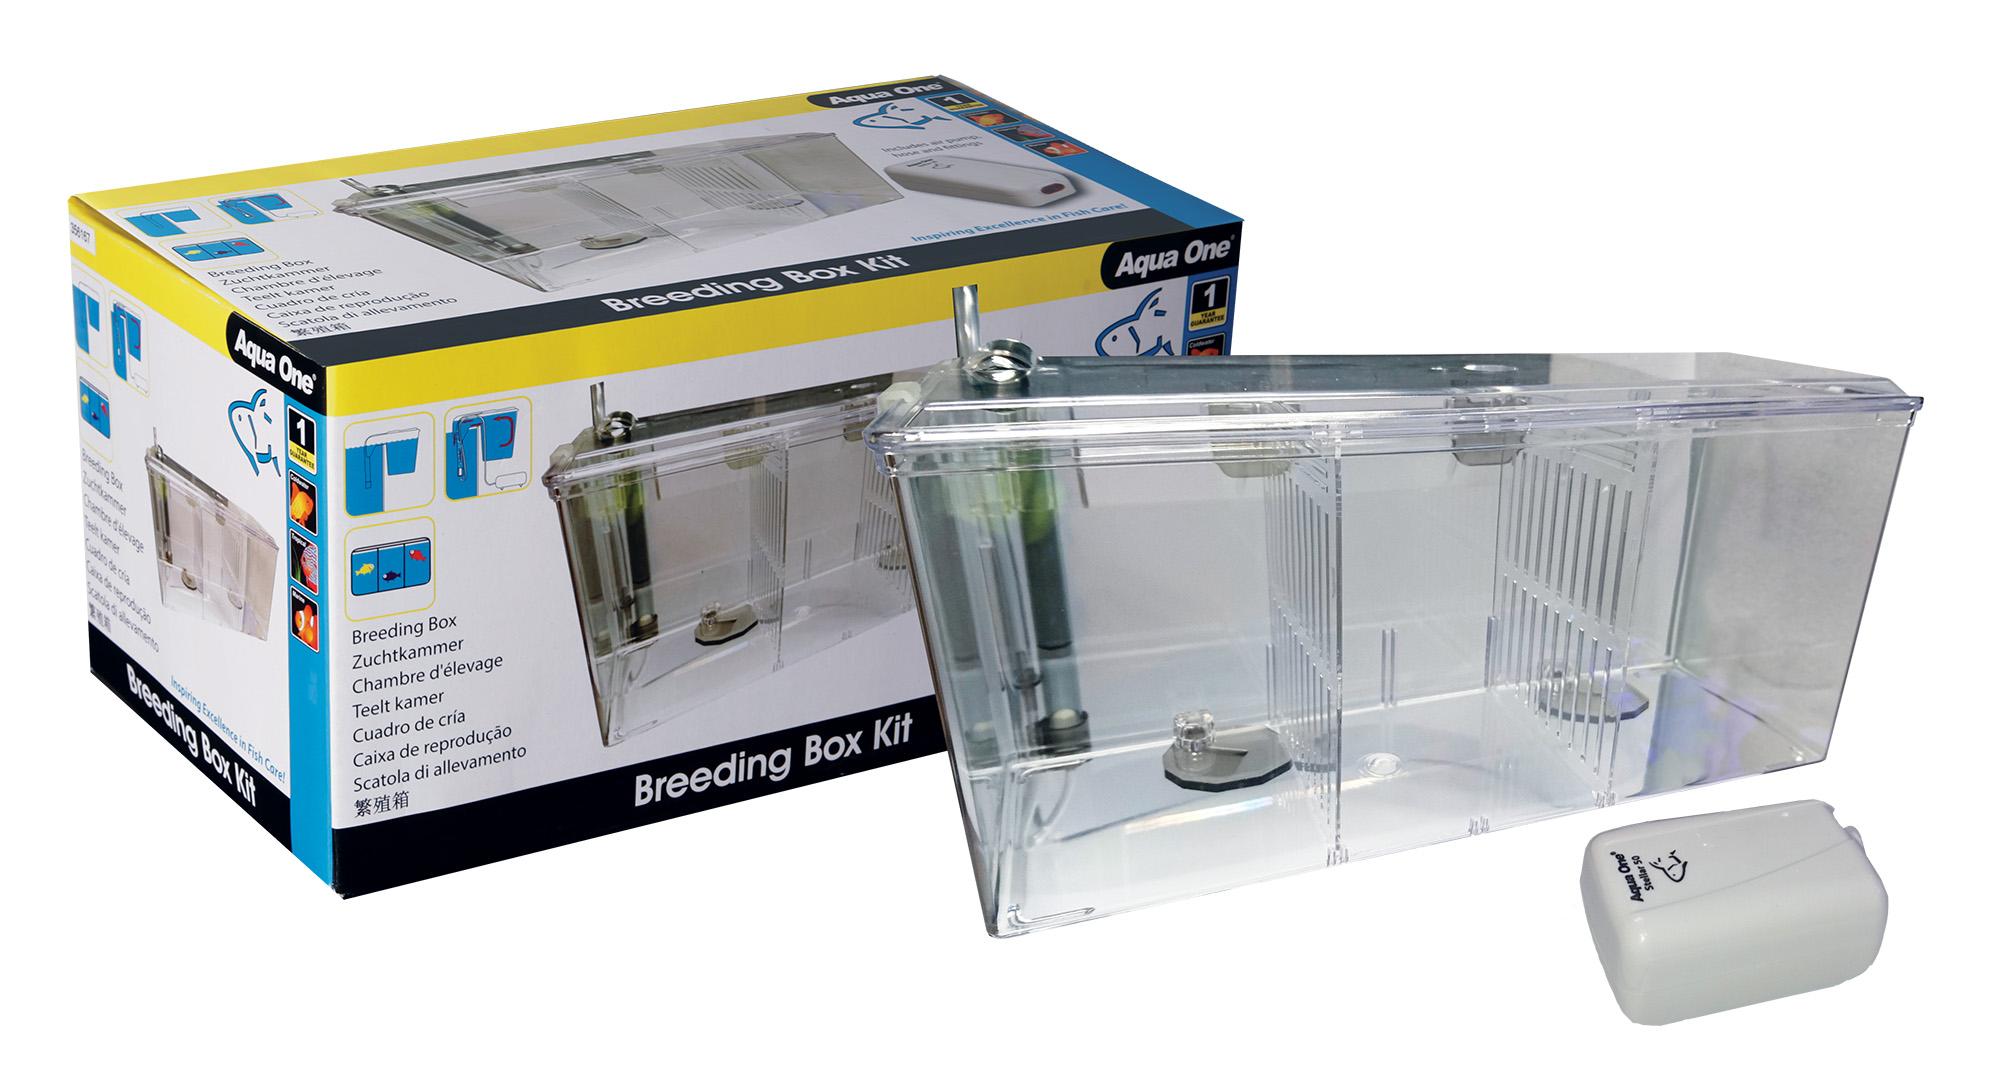 Breeding Box Kit